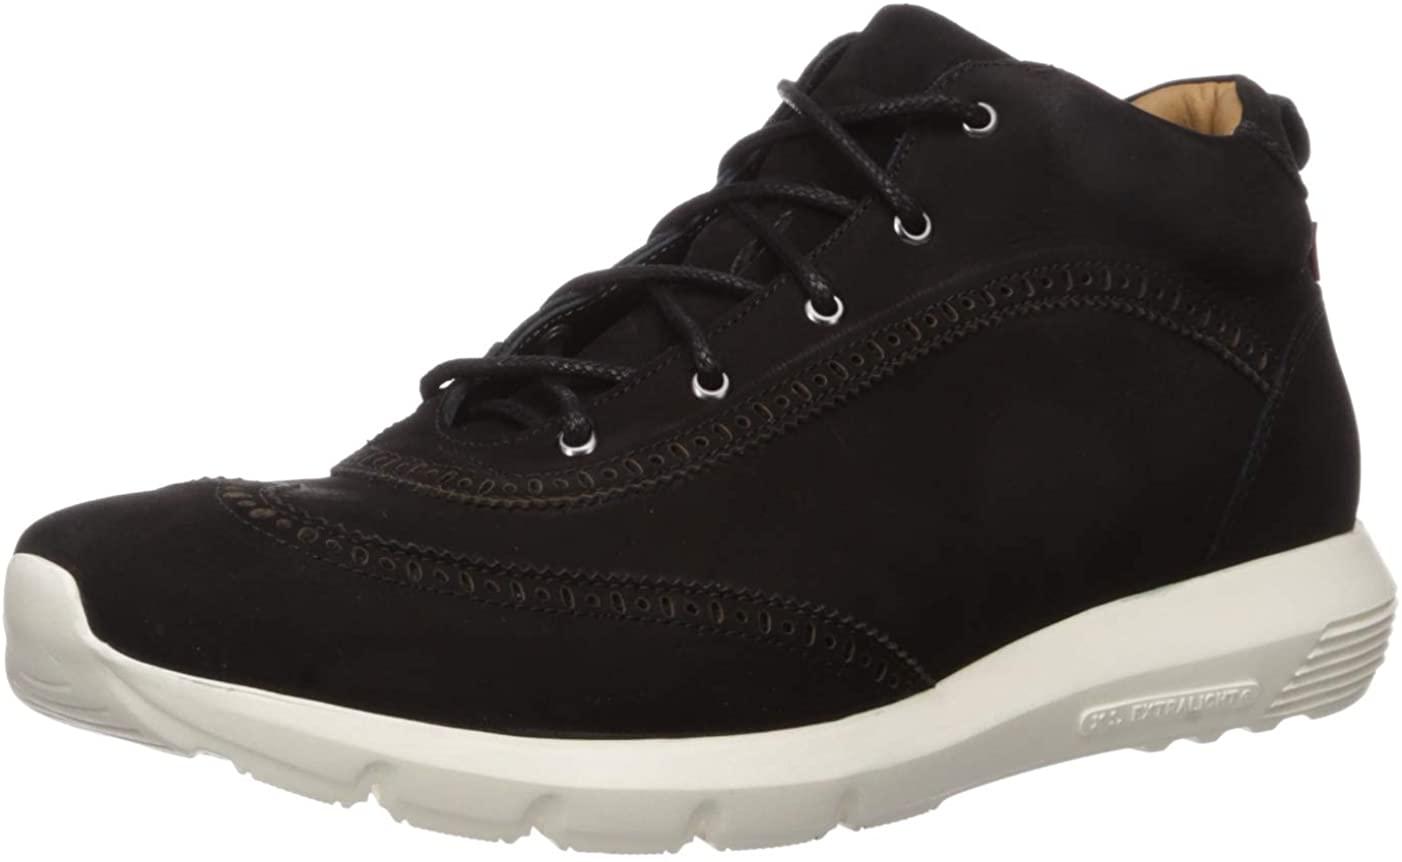 MARC JOSEPH NEW YORK Men's Leather Extra Lightweight Wingtip Ankle Boot